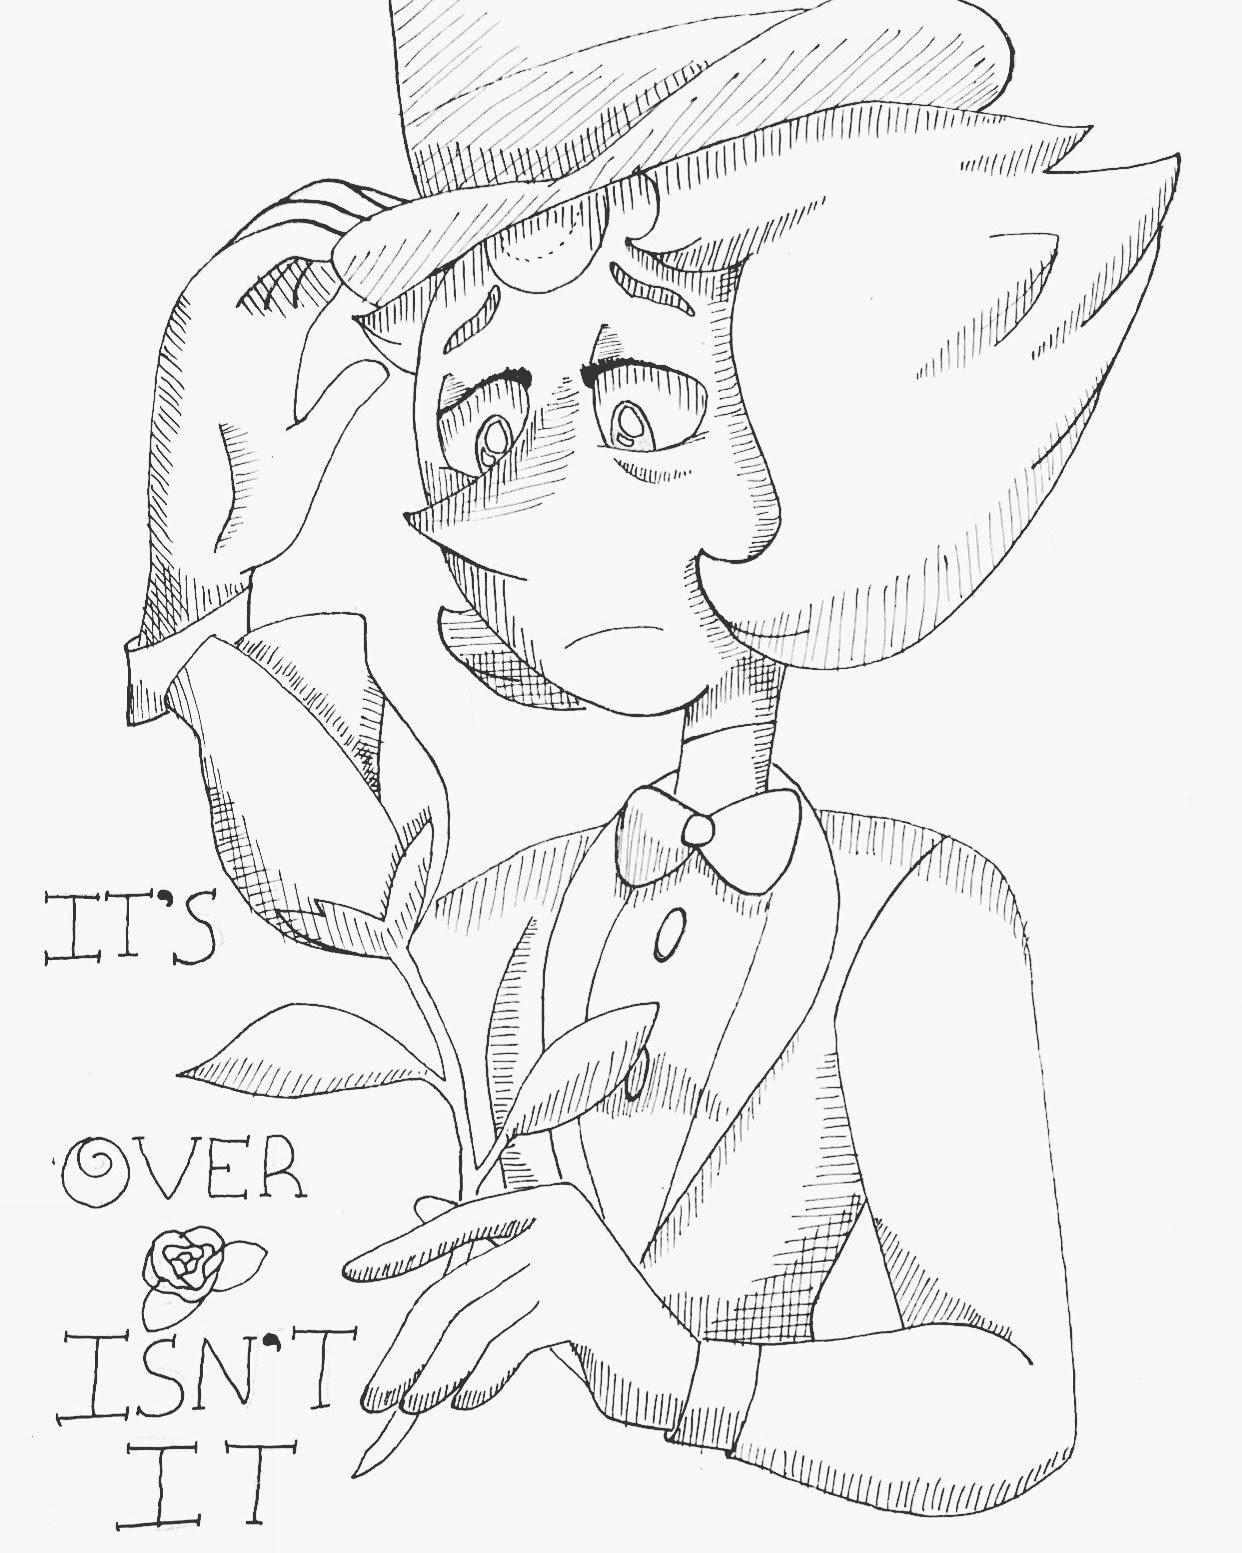 Isn't it over?